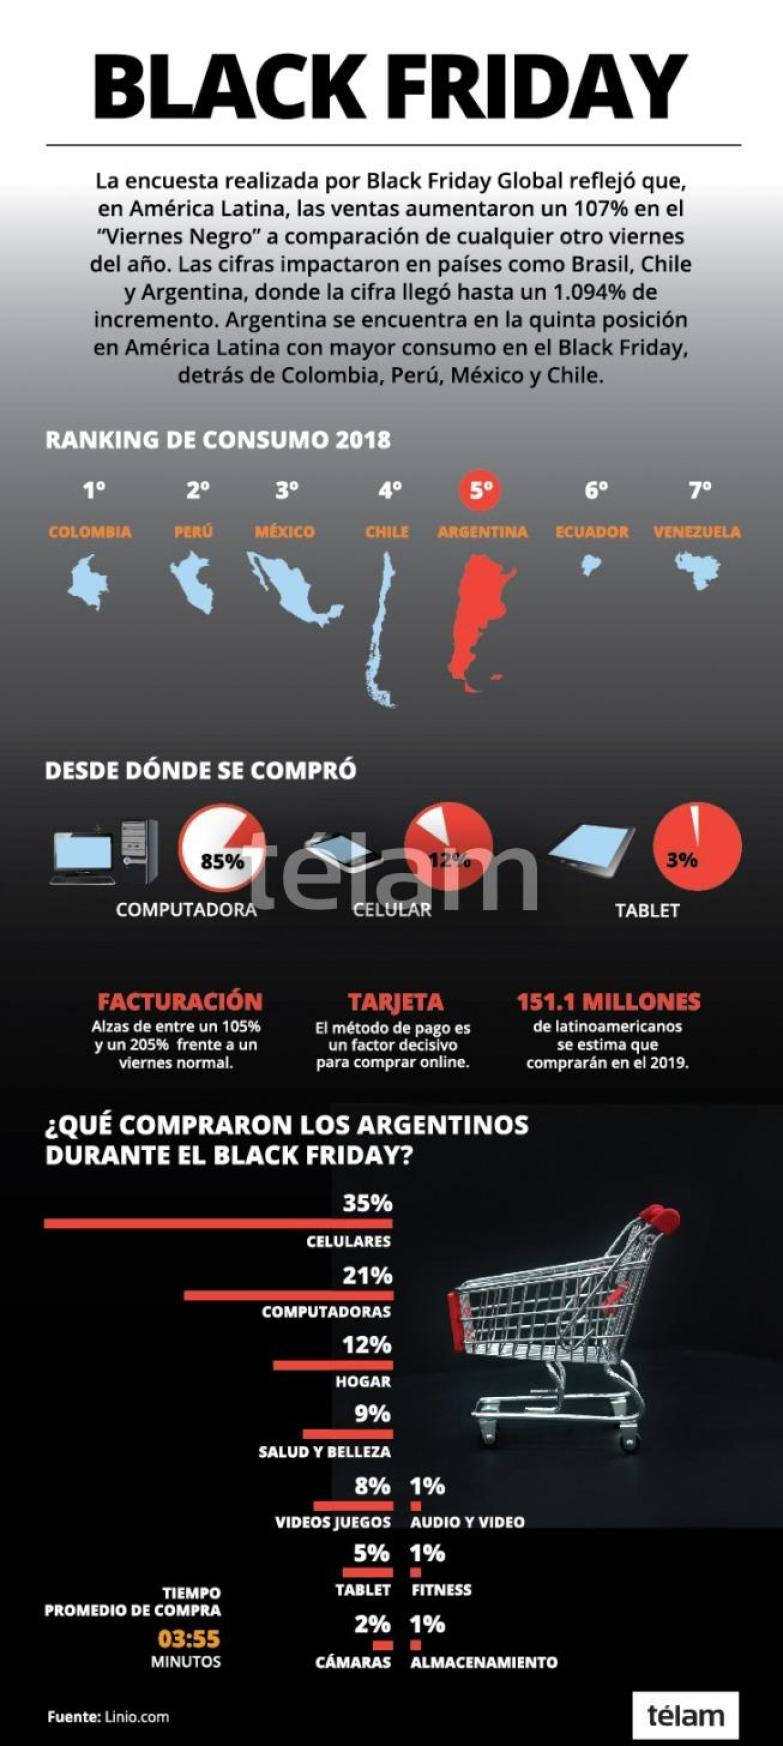 Black Friday 2018 en Latinoamérica